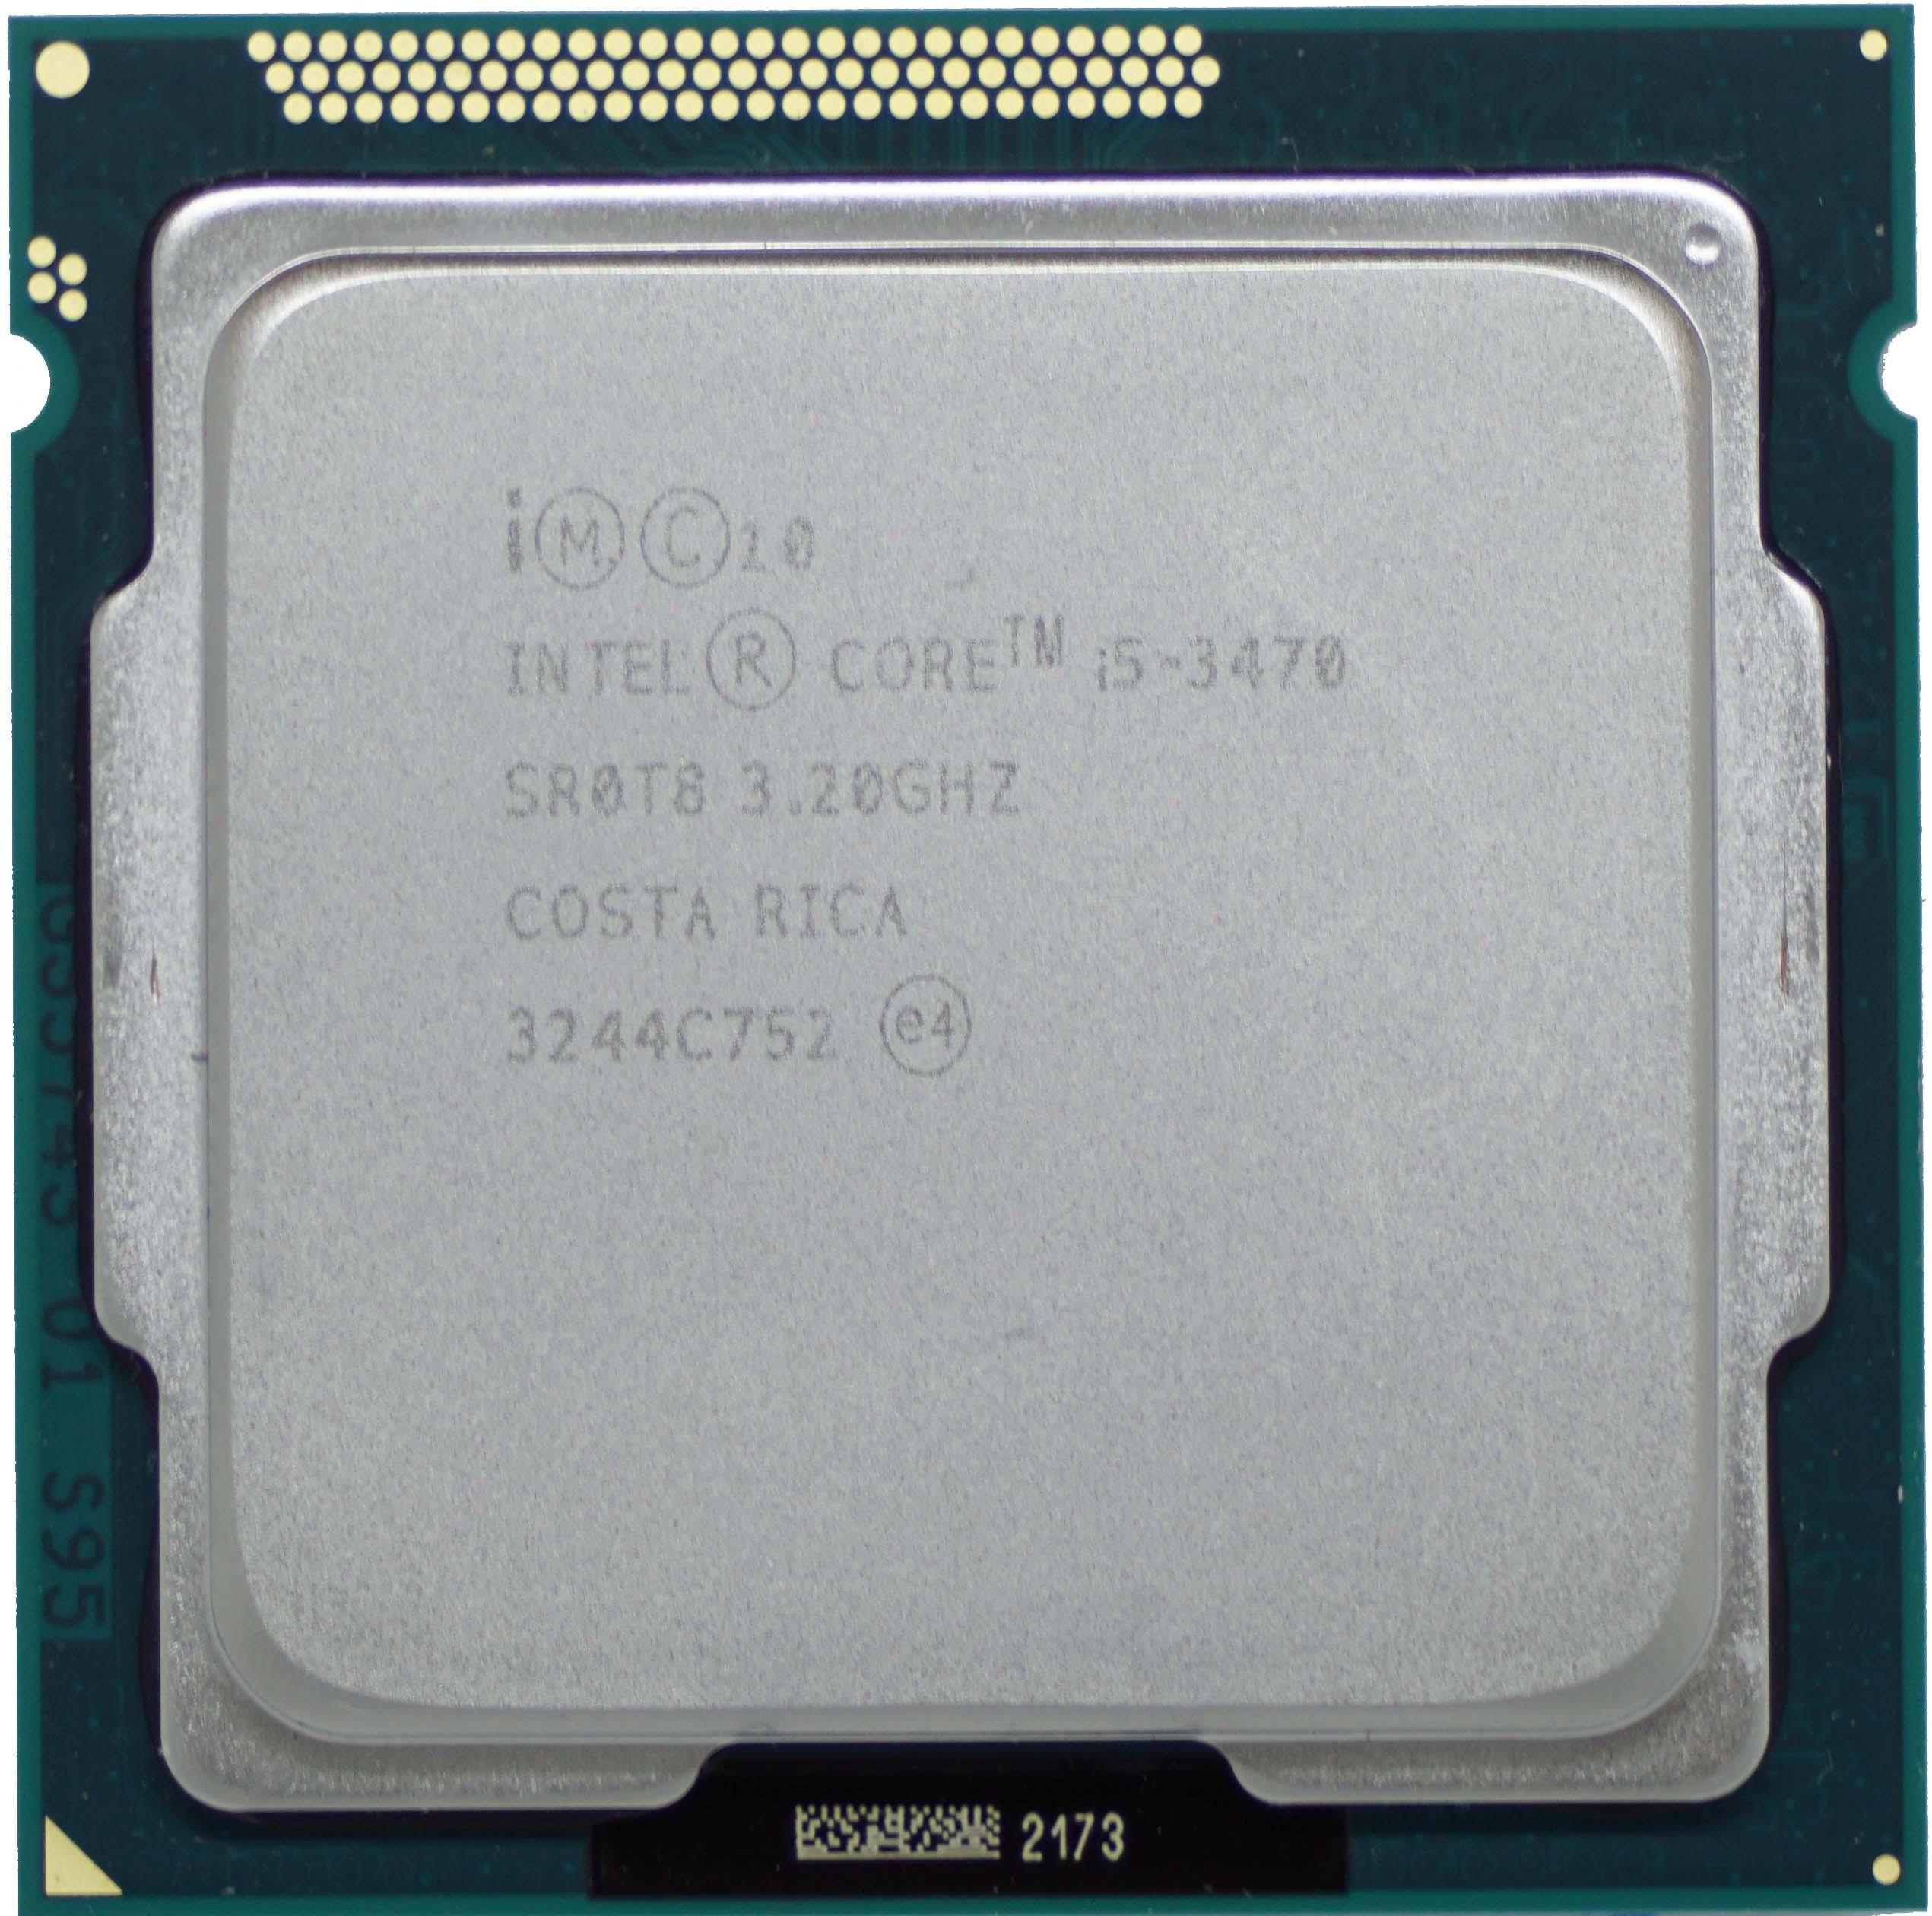 Intel Core i5-3470 (SR0T8) 3 20Ghz Quad (4) Core LGA1155 77W CPU